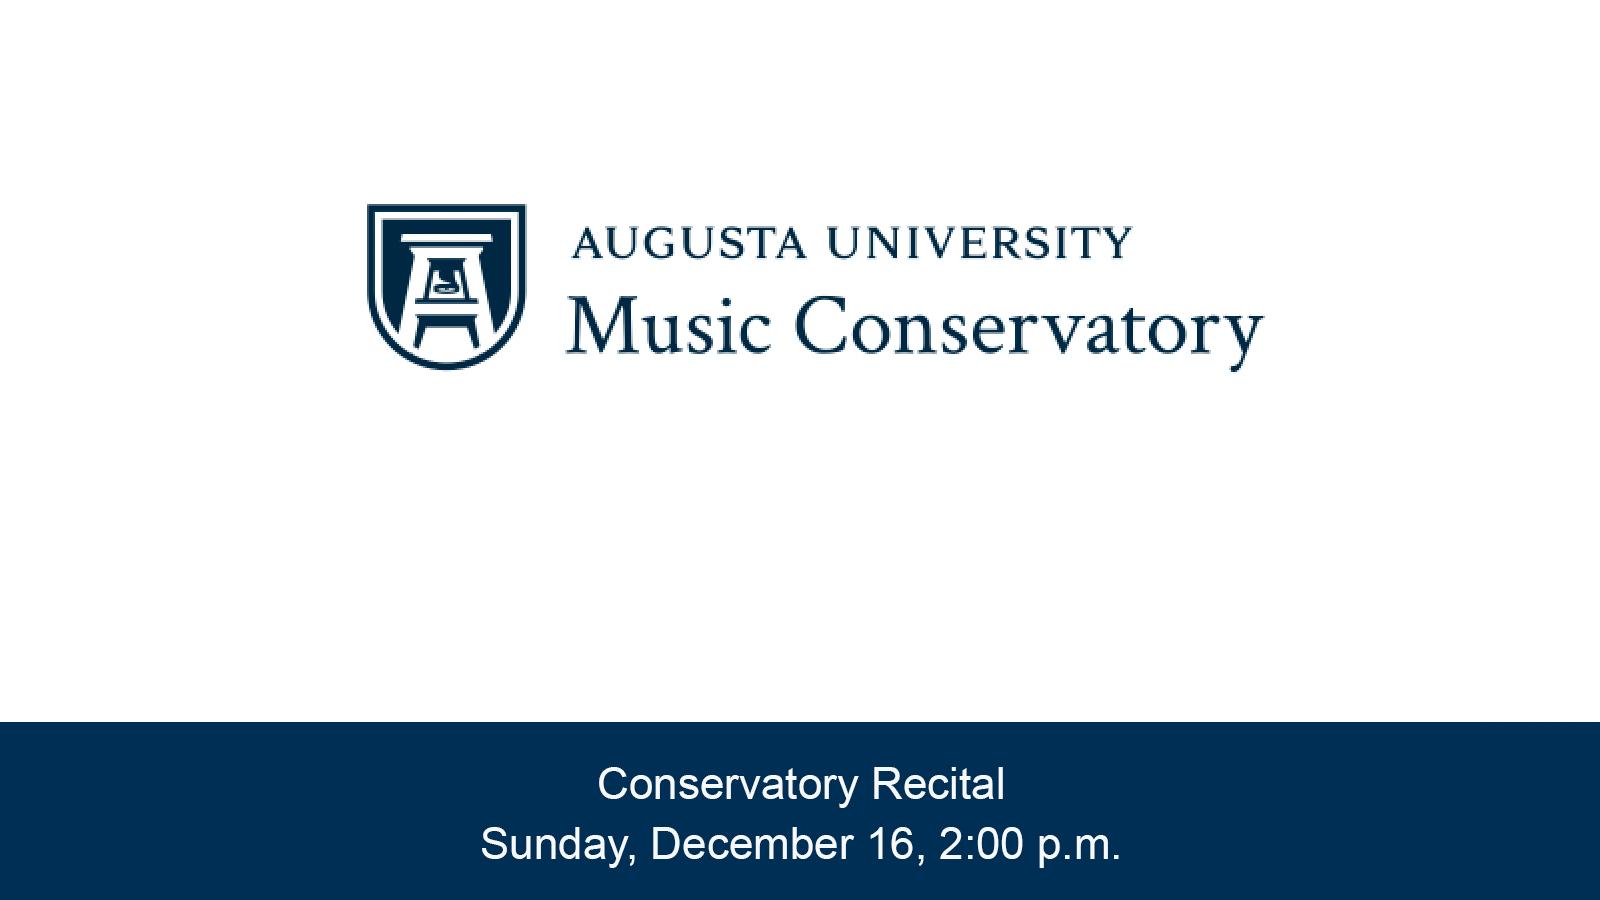 Conservatory Program Student Recital